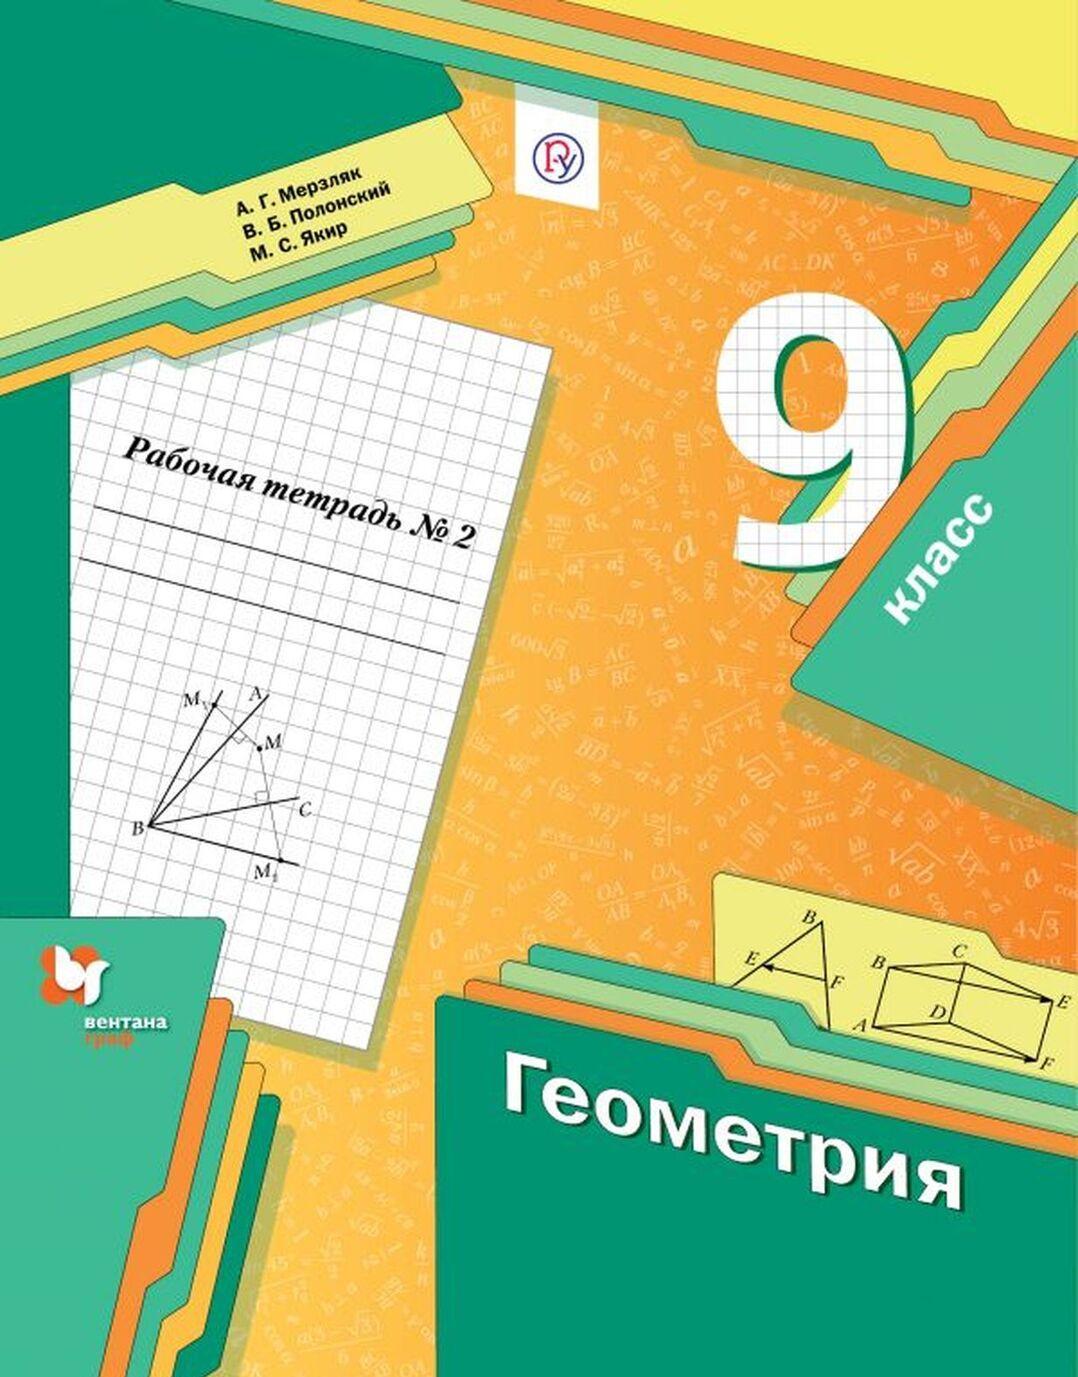 Geometrija. 9klass. Rabochaja tetrad № 2 | Merzljak Arkadij Grigorevich, Jakir Mikhail Semenovich